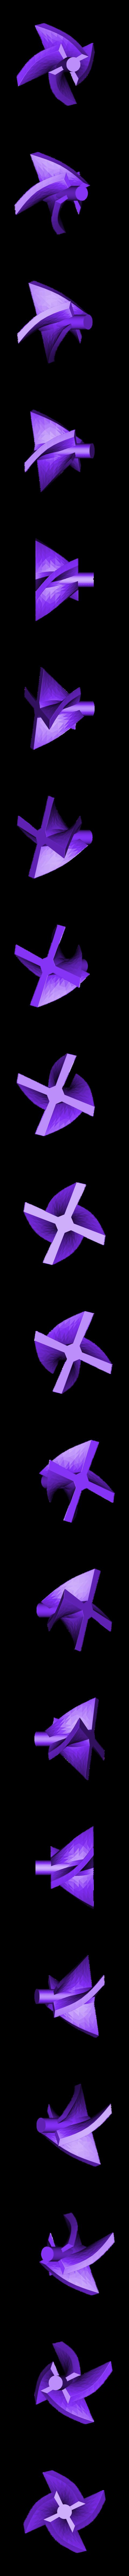 prop_v2.stl Download free STL file Gowanus Monster - Margo Series • 3D printable object, boldmachines